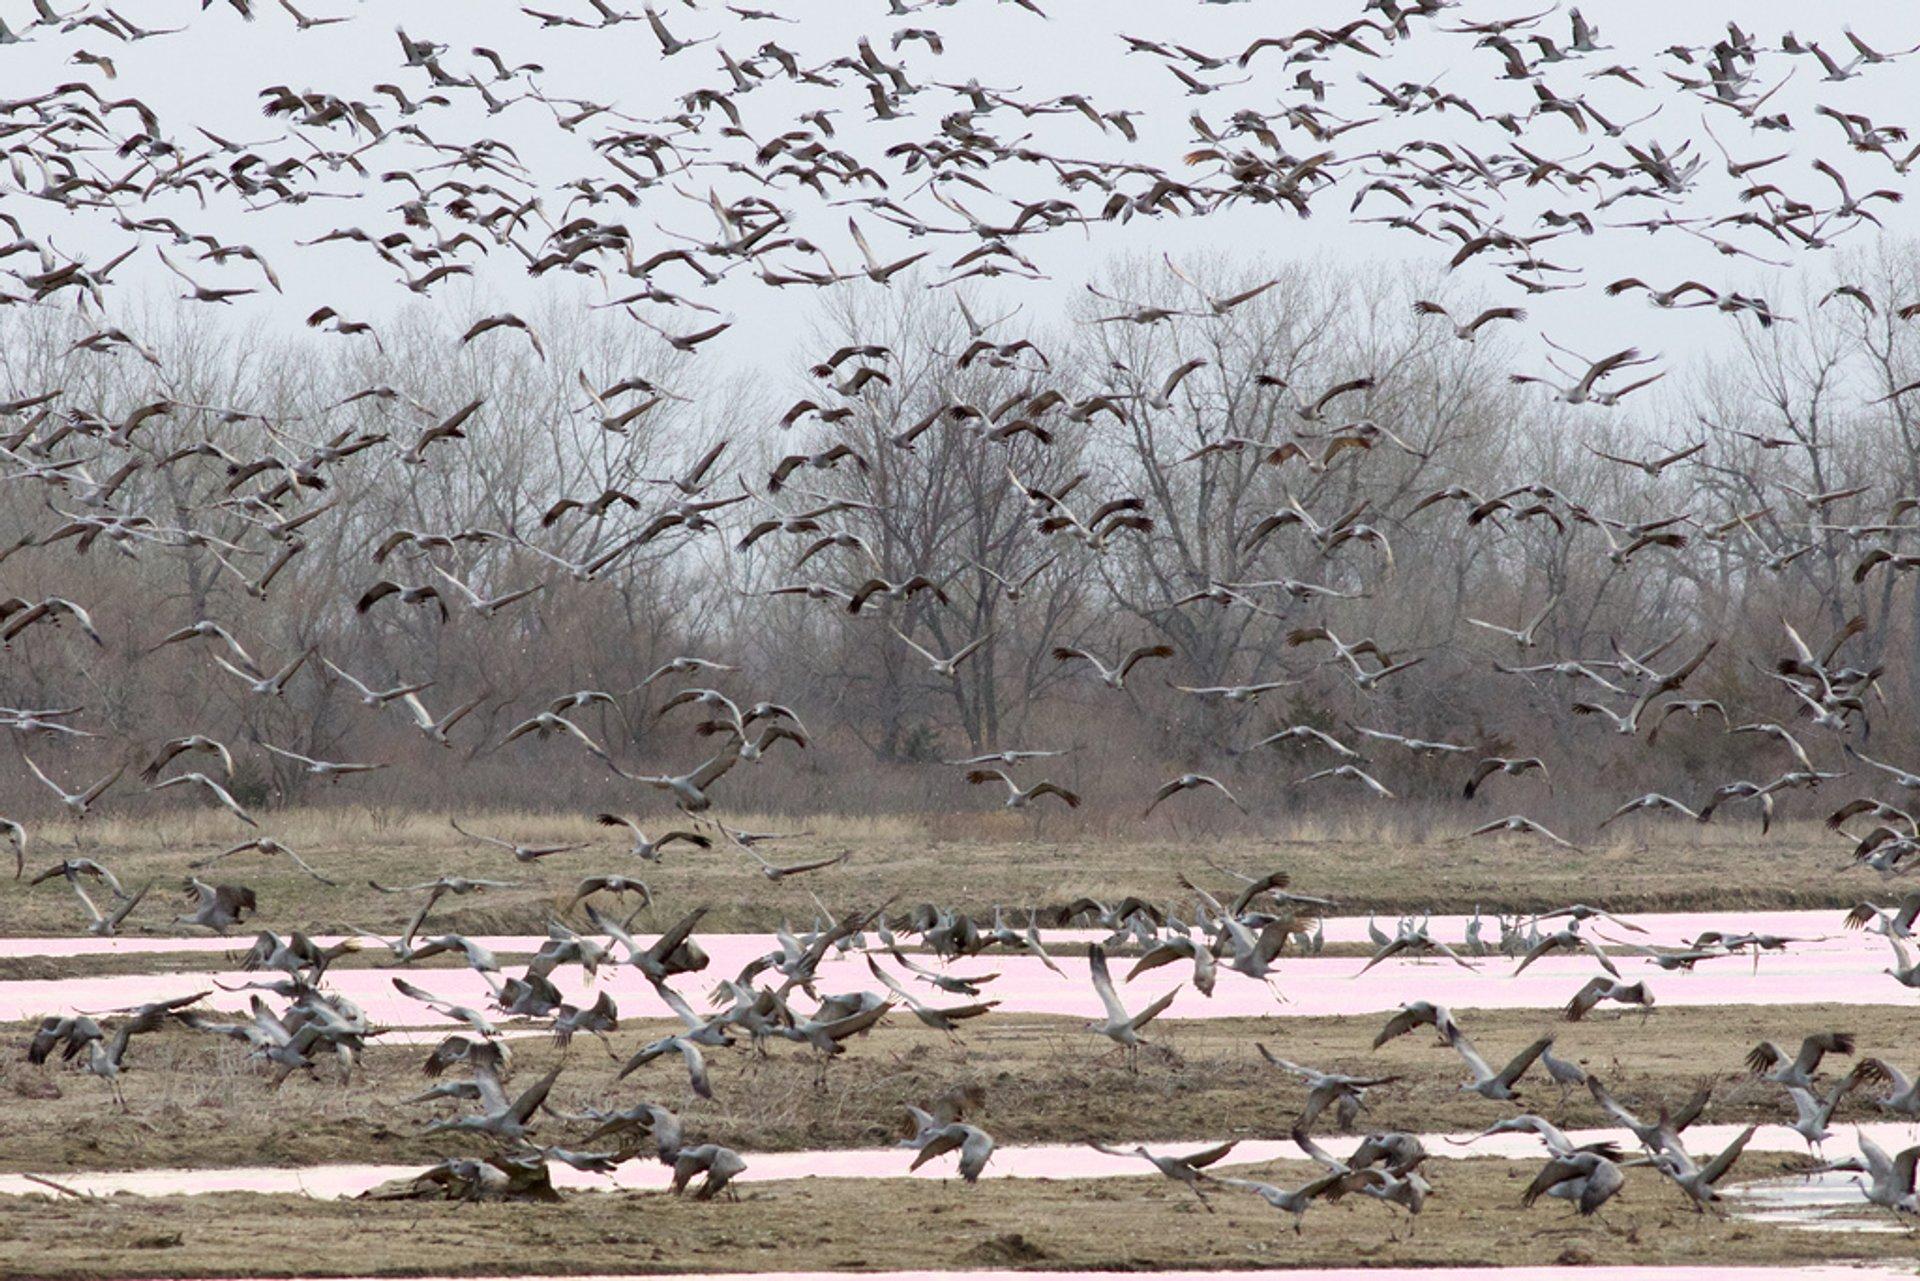 Sandhill Crane Migration in Midwest 2019 - Best Time